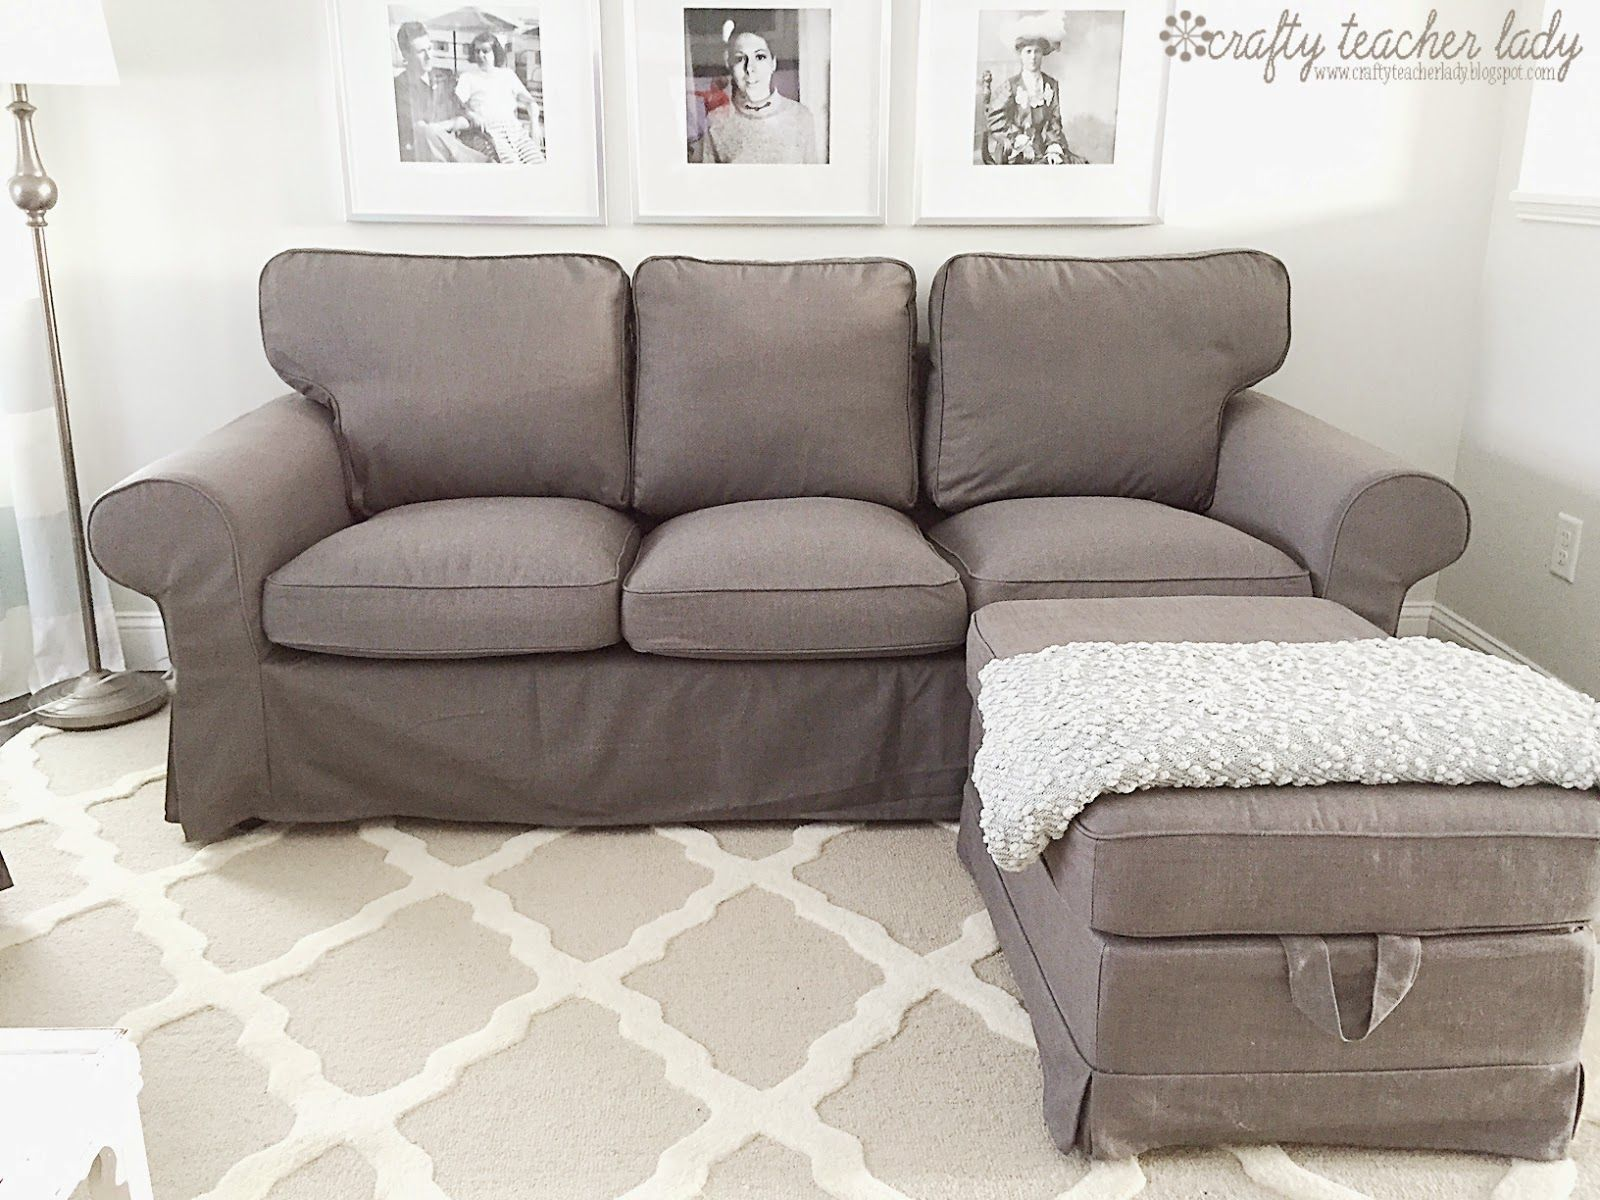 crafty teacher lady review of the ikea ektorp sofa series rh pinterest com IKEA Ektorp Sofa Decorating Ideas IKEA Ektorp Dimensions